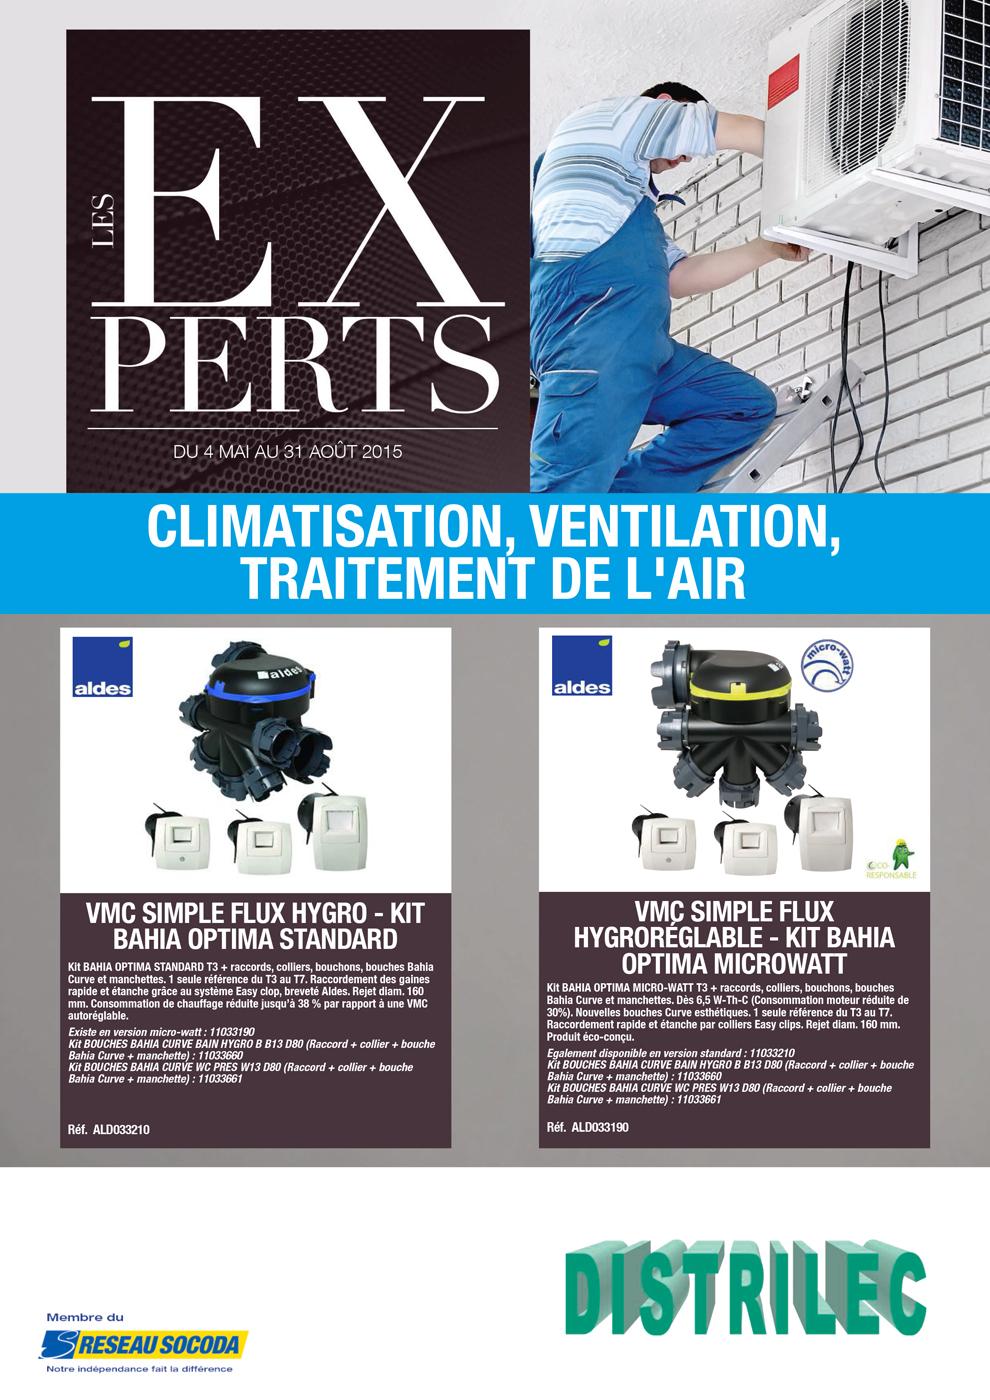 socoda distrilec distrilec climatisation ventilation traitement de l 39 air mai 2015 page 1. Black Bedroom Furniture Sets. Home Design Ideas